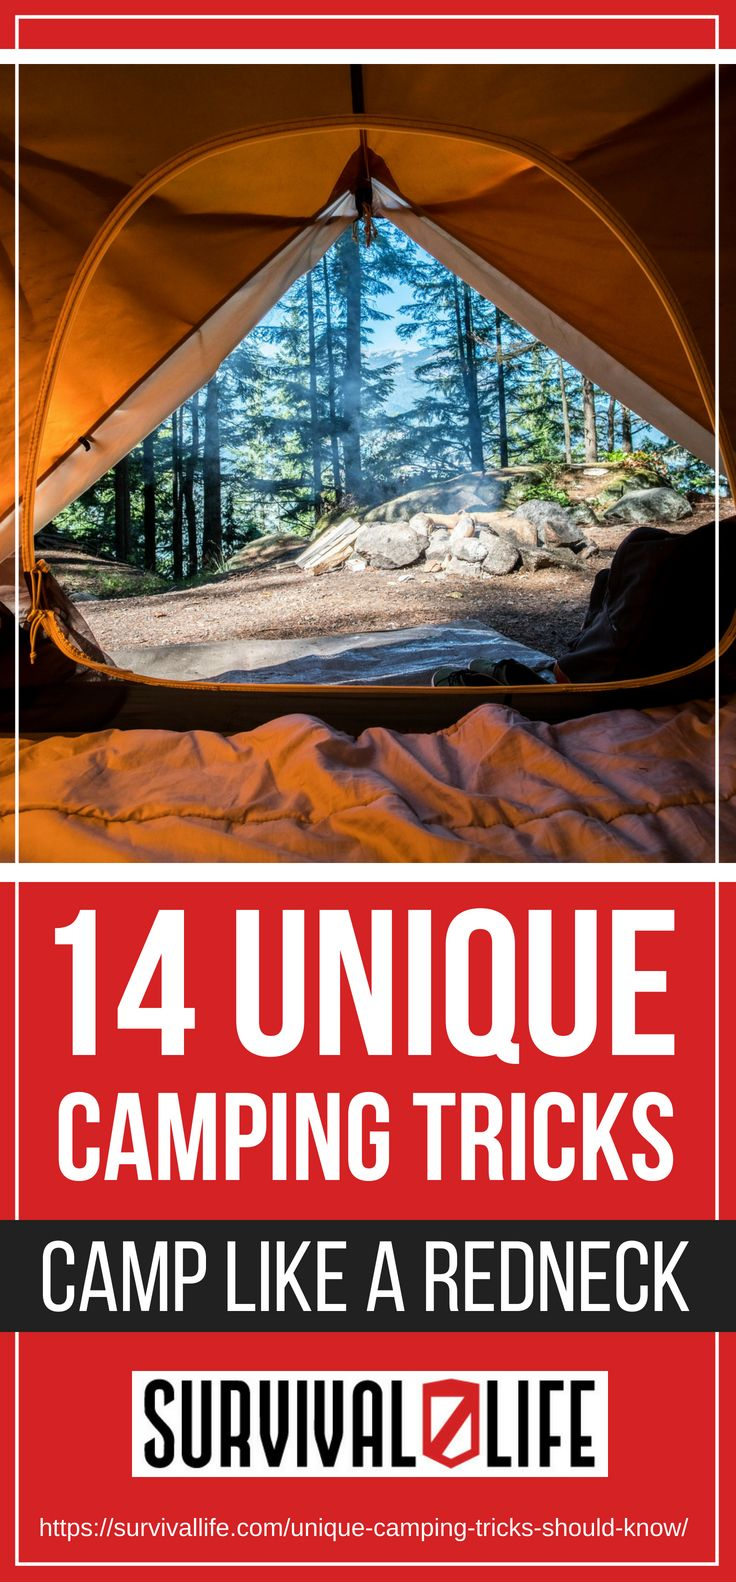 Unique Camping Tricks | Camp Like A Redneck | https://survivallife.com/unique-camping-tricks-should-know/